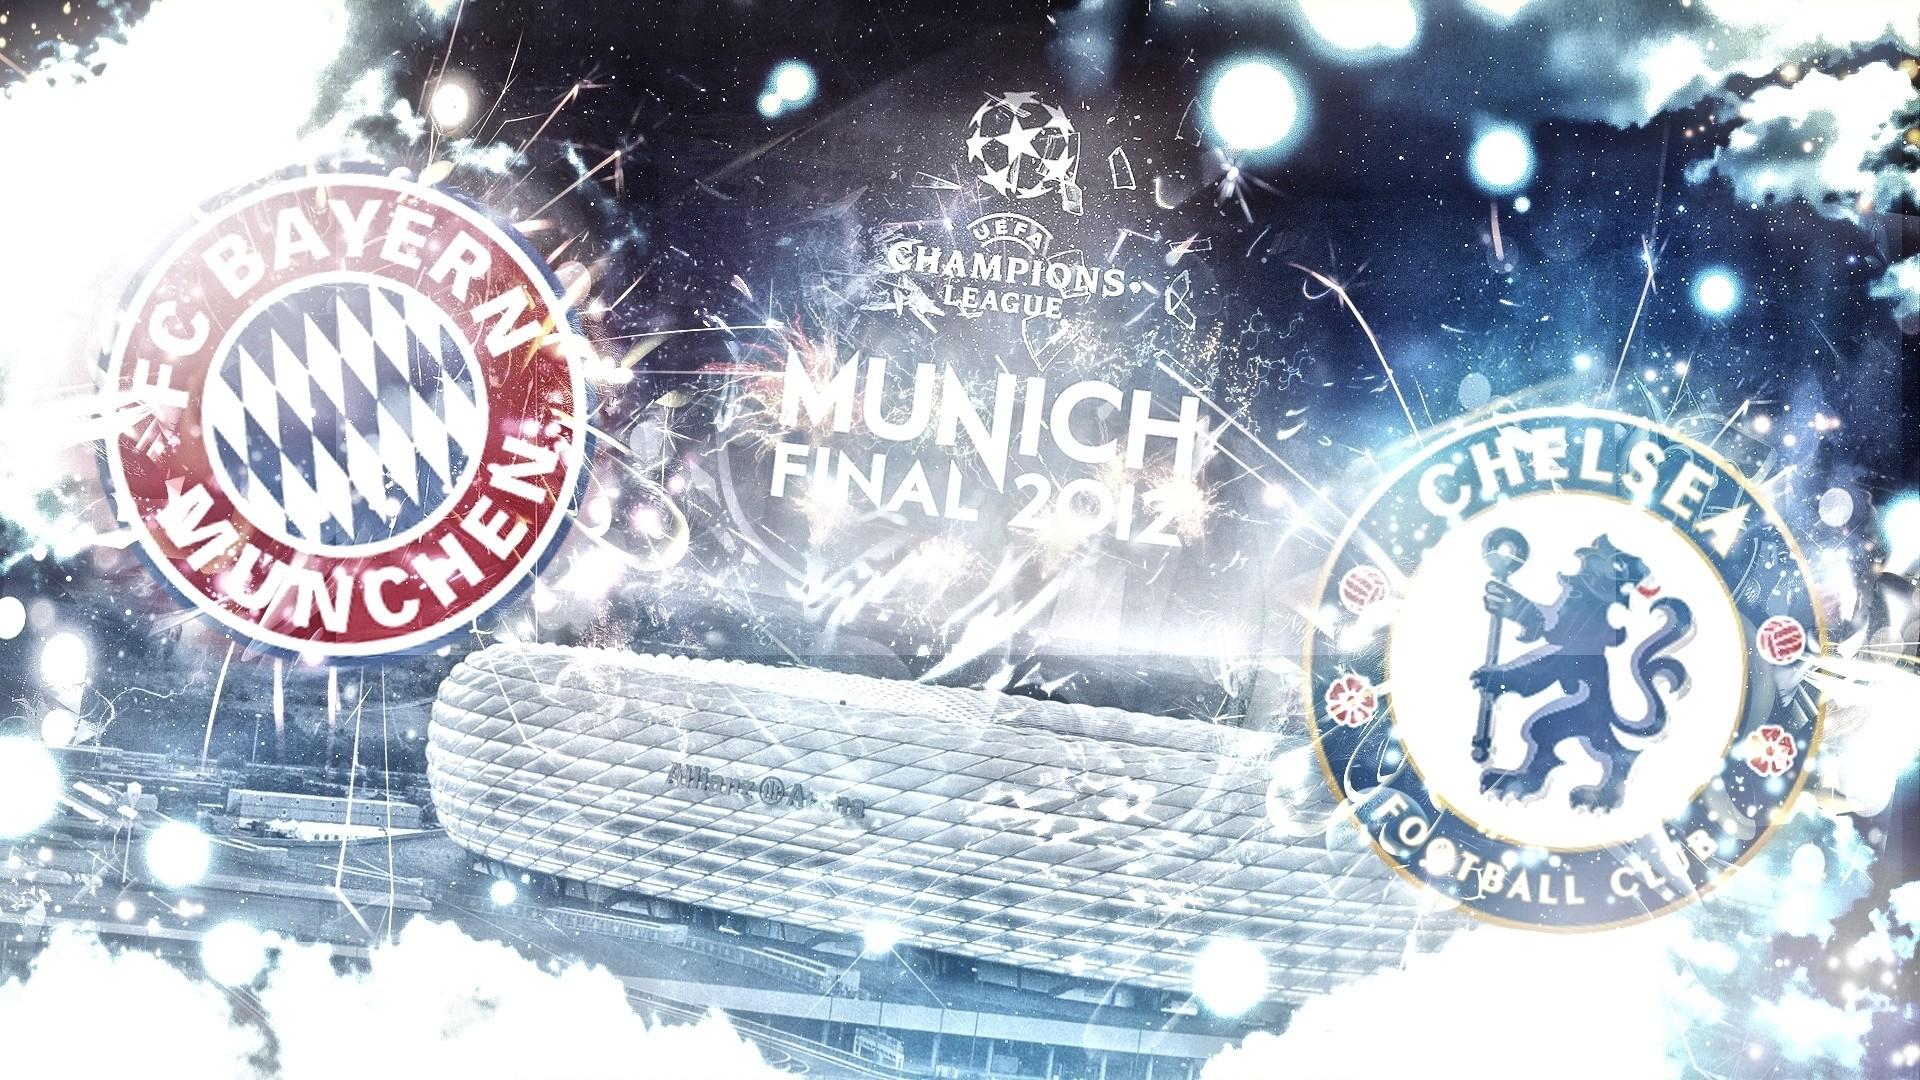 Champions Chelsea Wallpaper